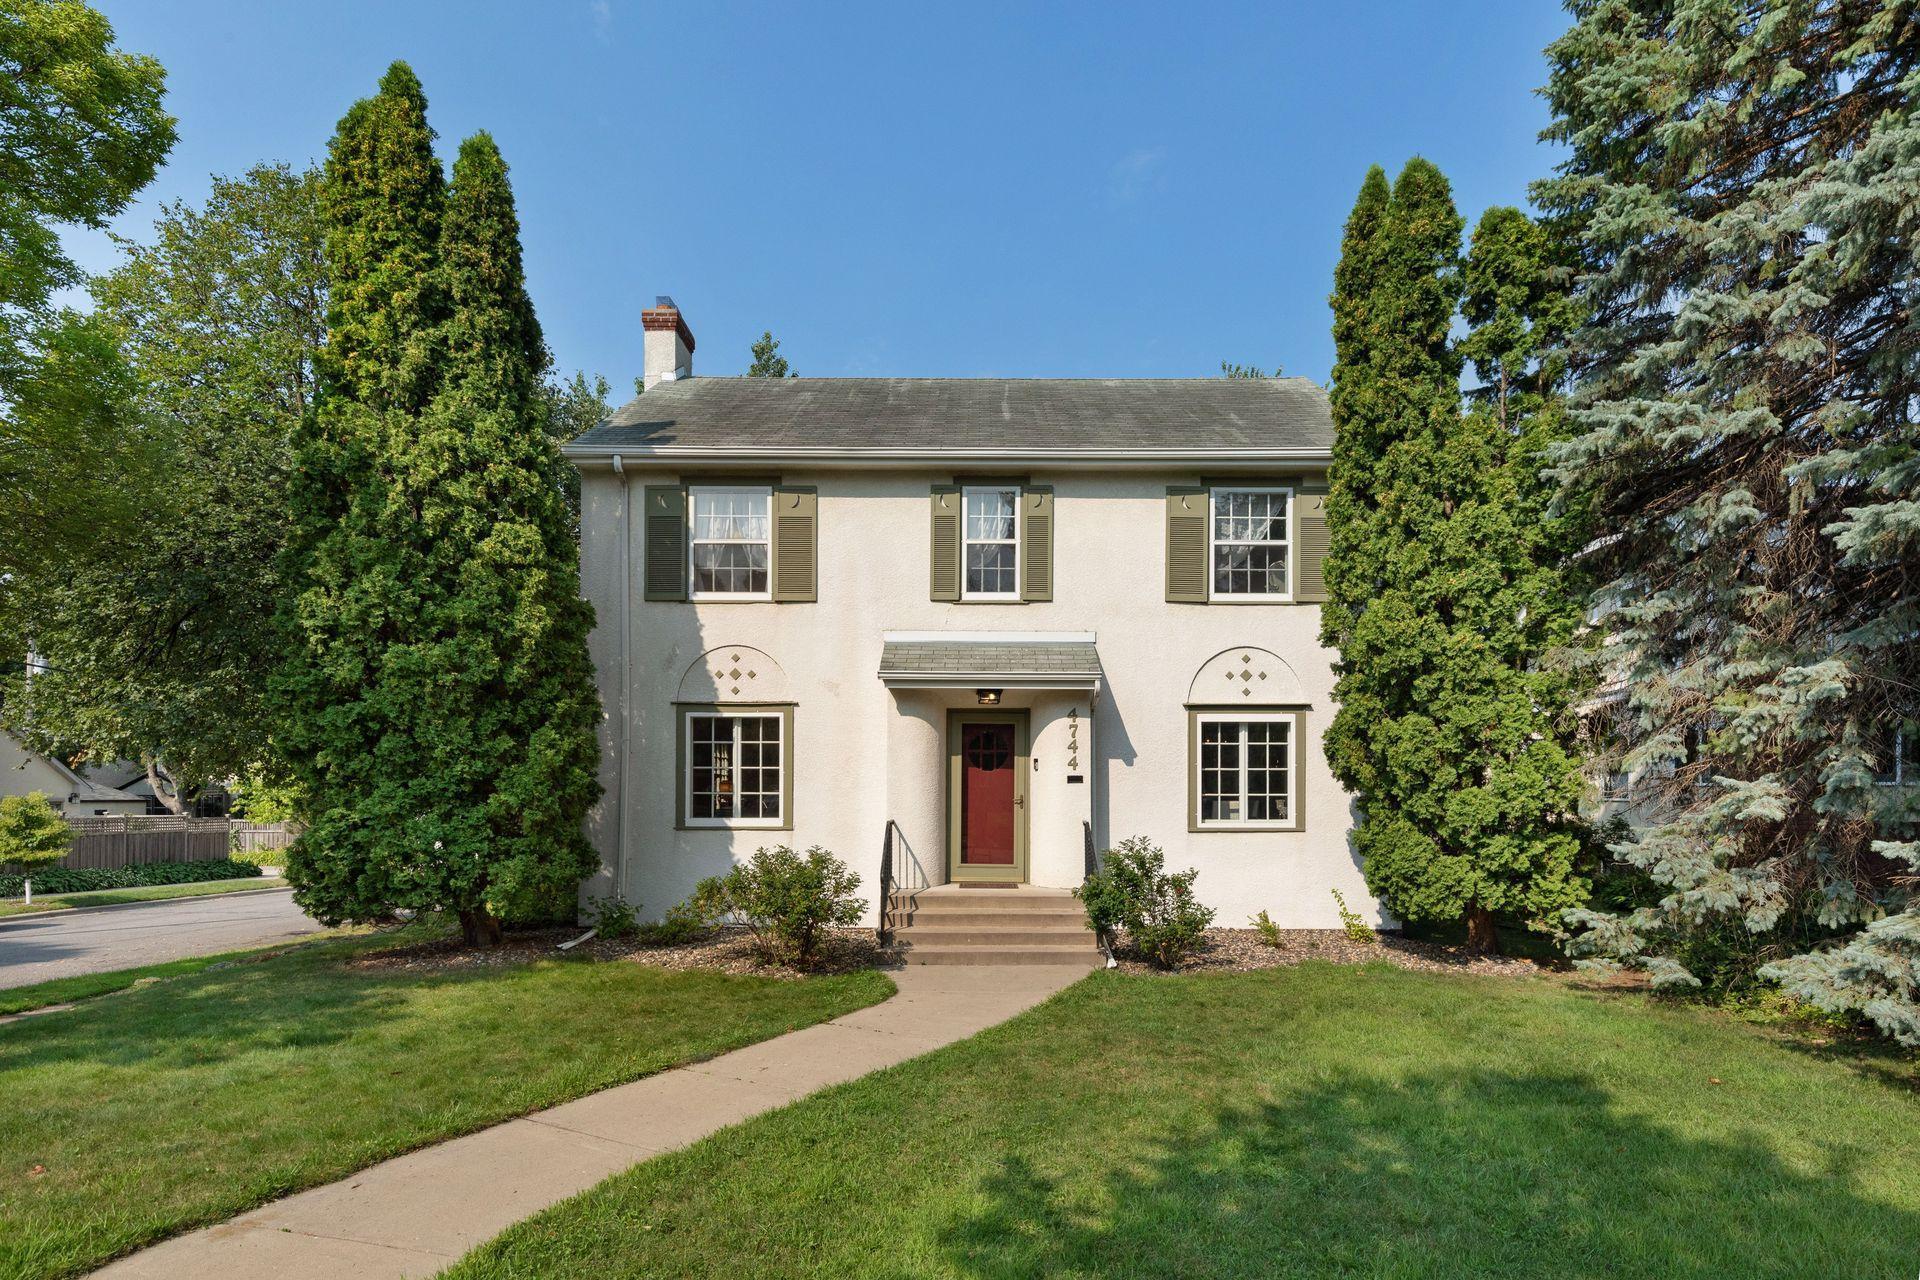 4744 10th Avenue S Property Photo - Minneapolis, MN real estate listing